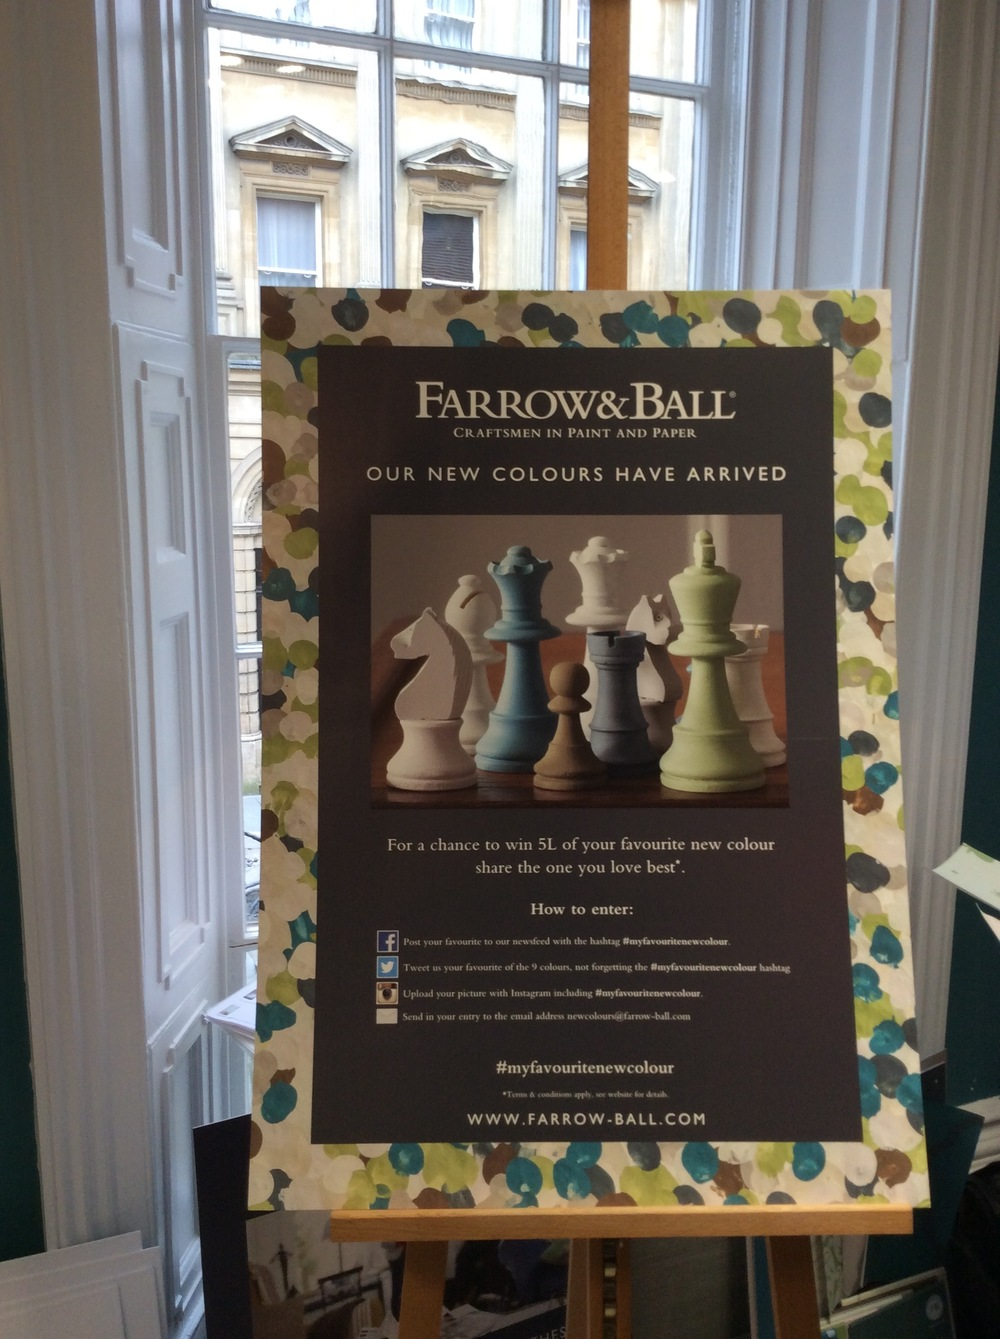 Introducing Farrow & Ball's New 2016 Colour Collection